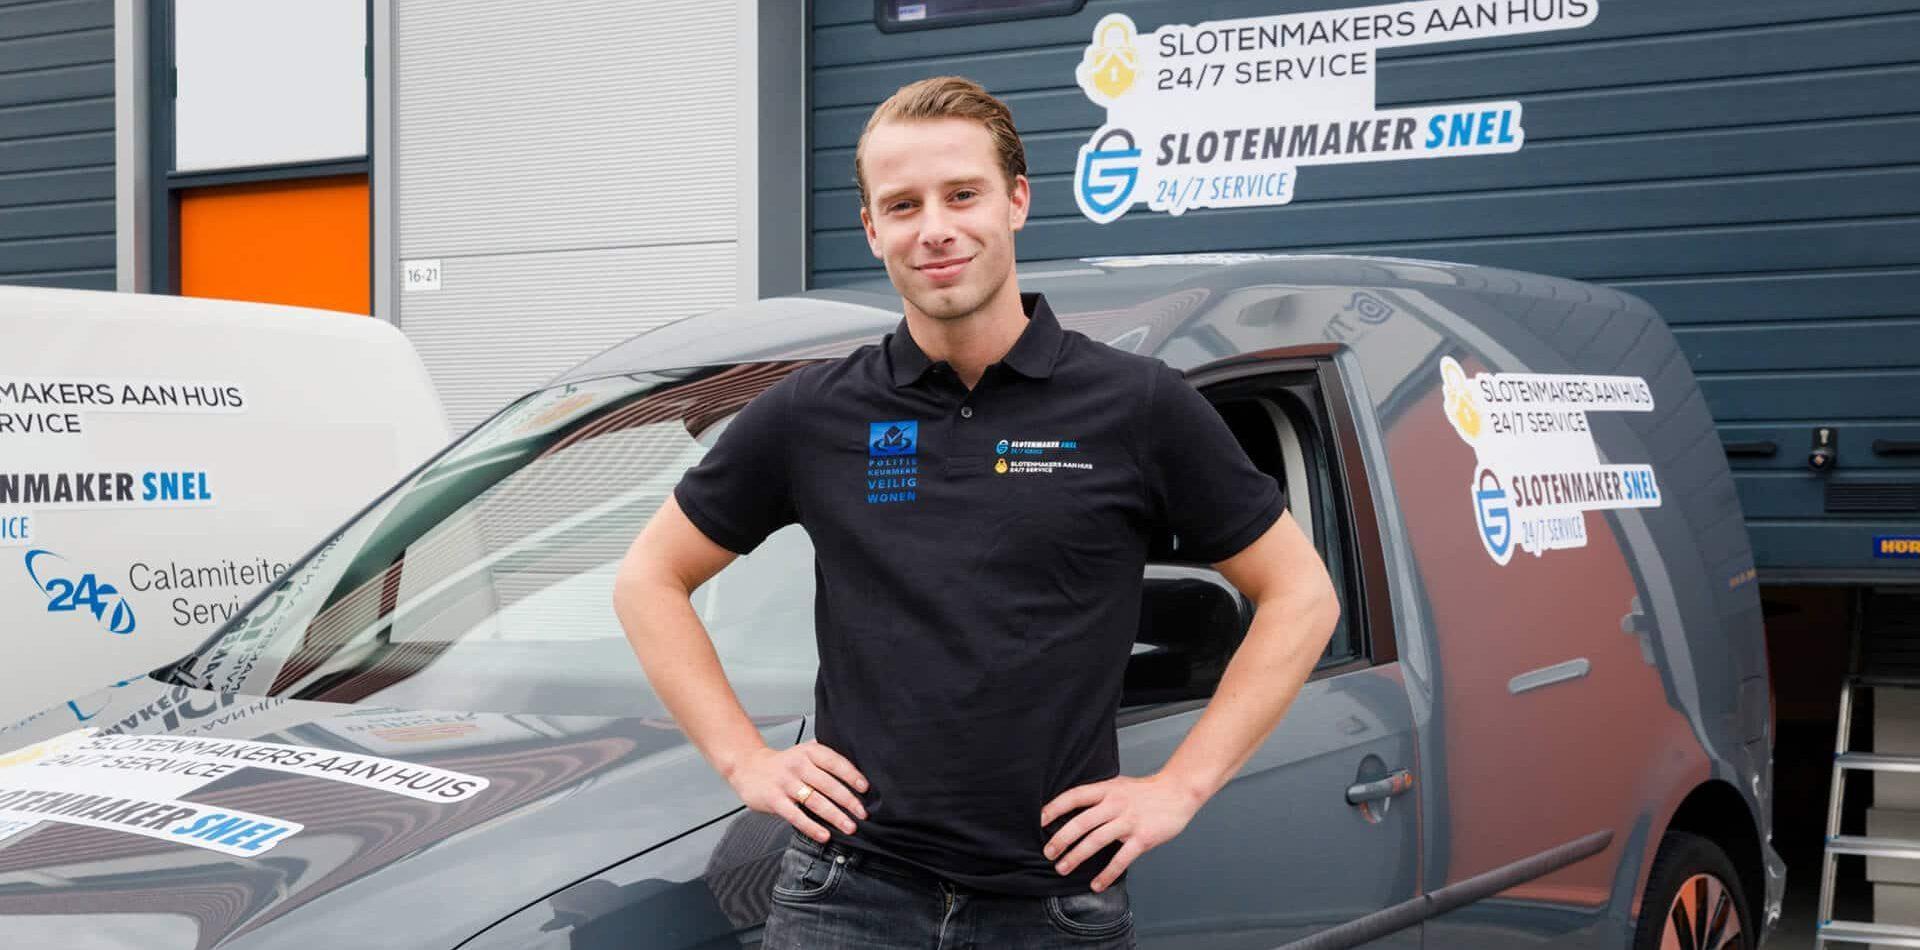 Slotenmaker Voorhout